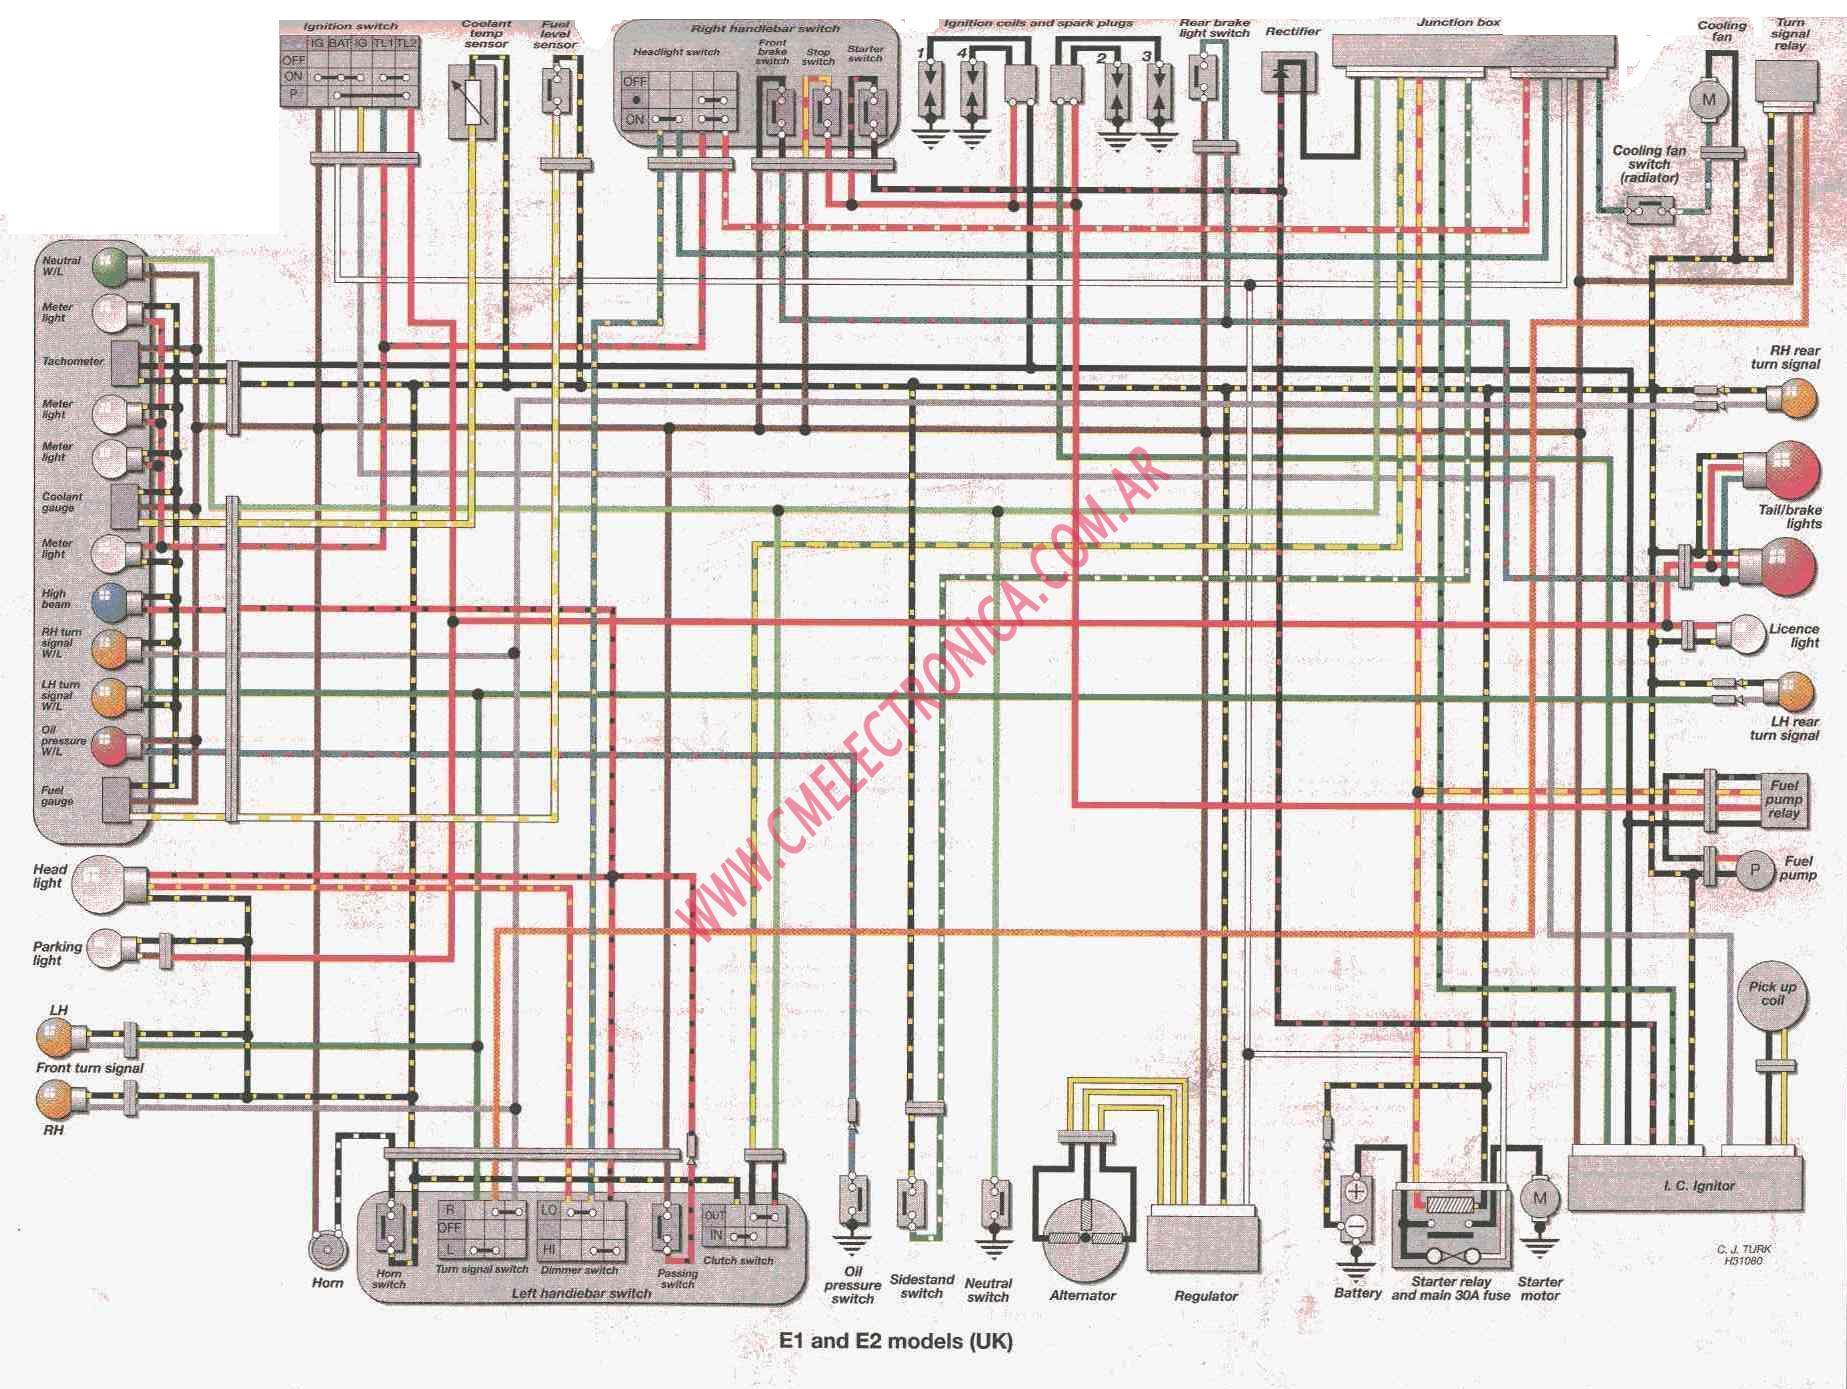 07 gsxr 600 fuel pump wiring diagram citroen berlingo stereo 92 750 radiator elsavadorla